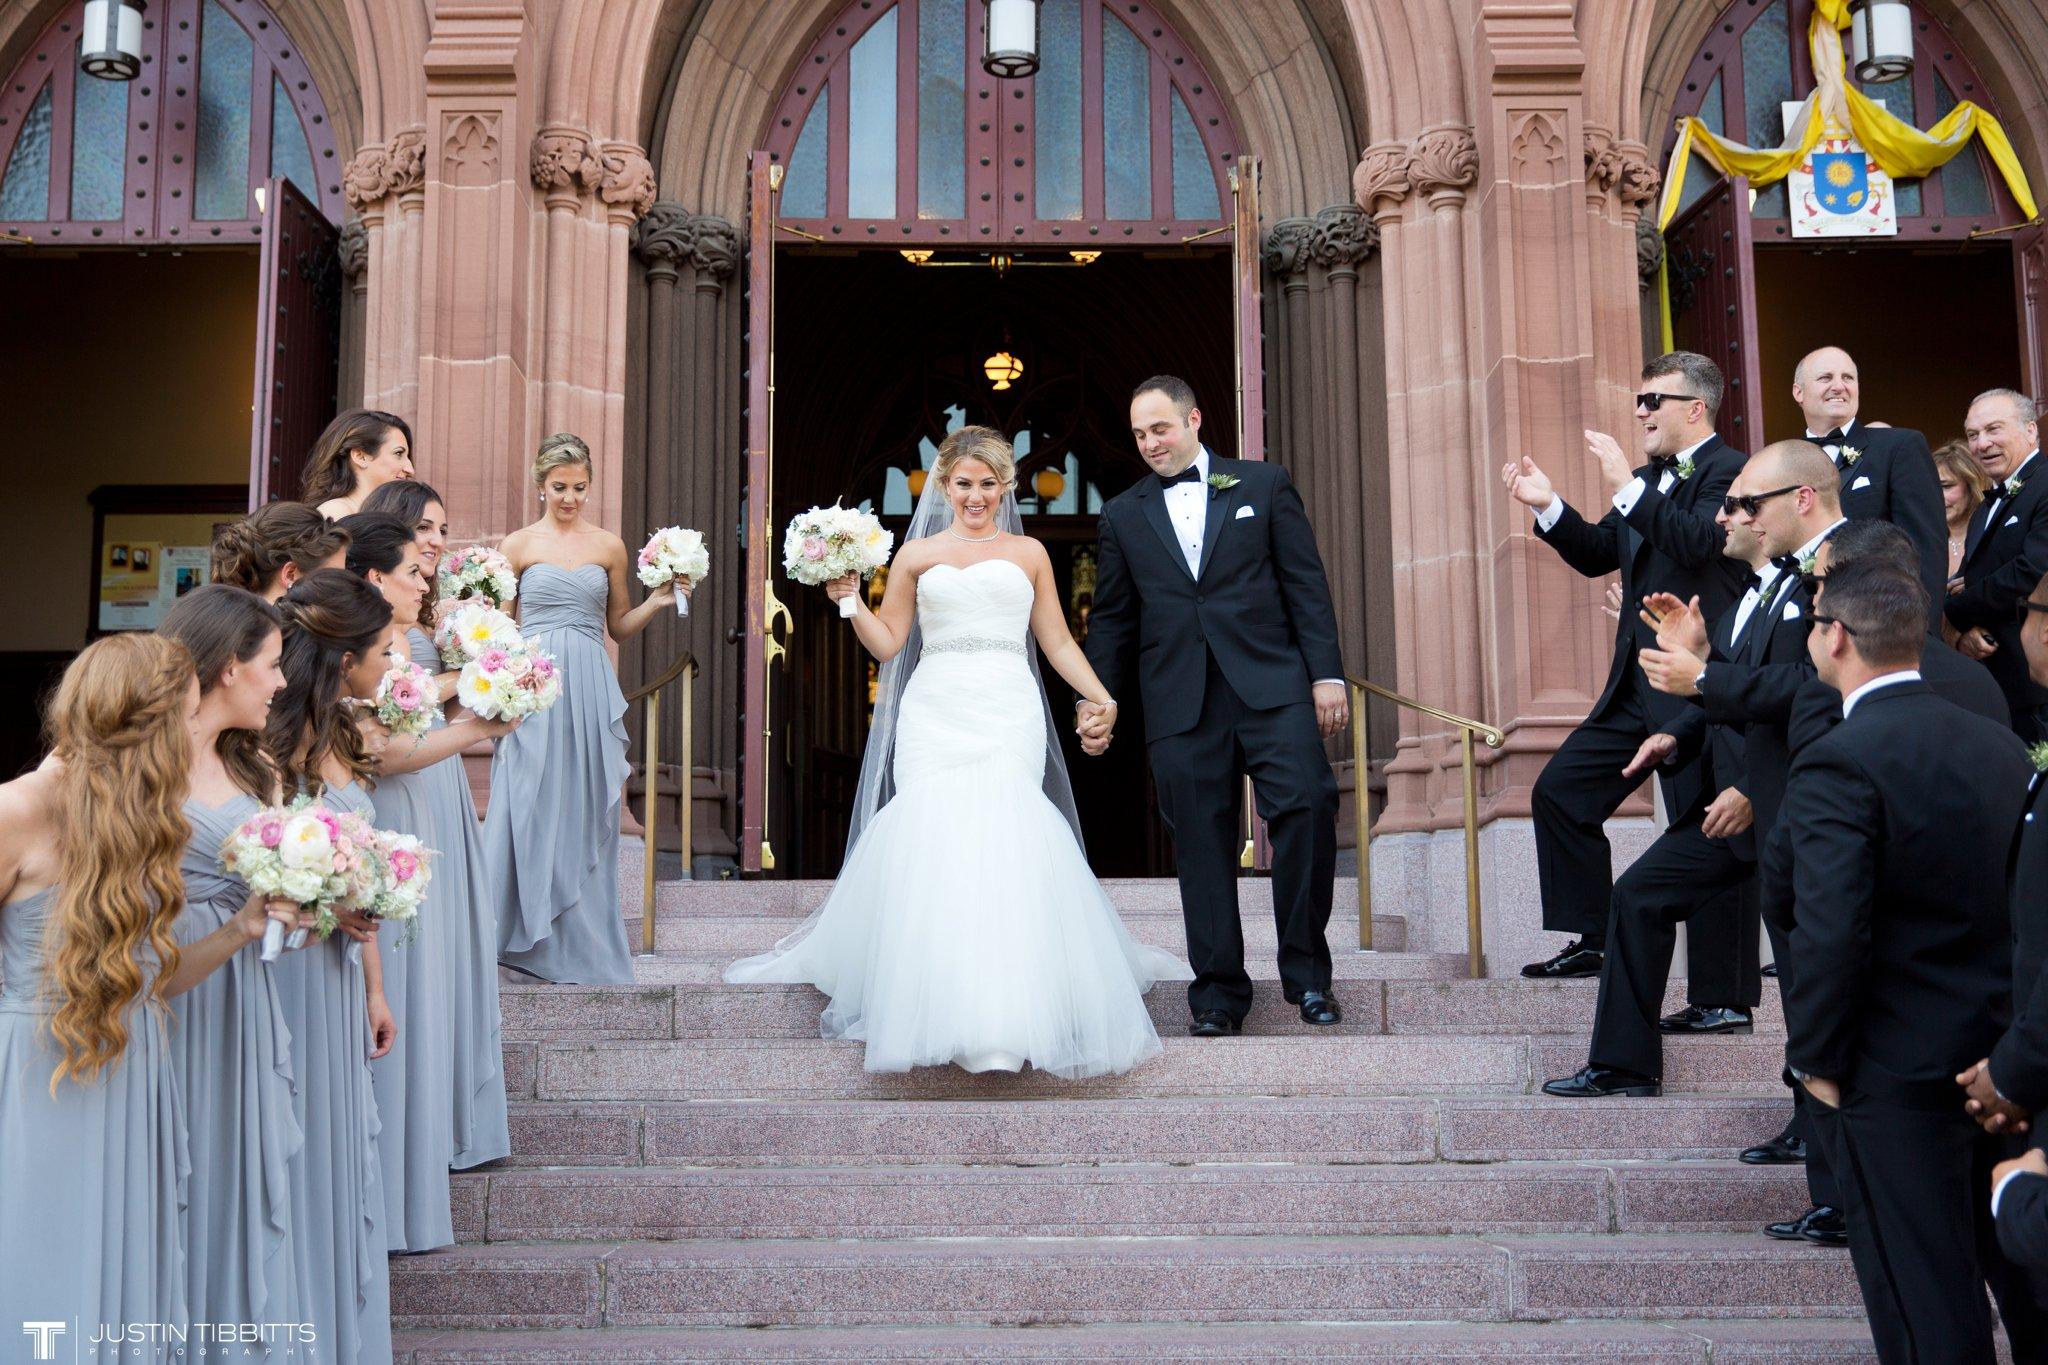 state-room-wedding-photos-with-amanda-and-nick_0102